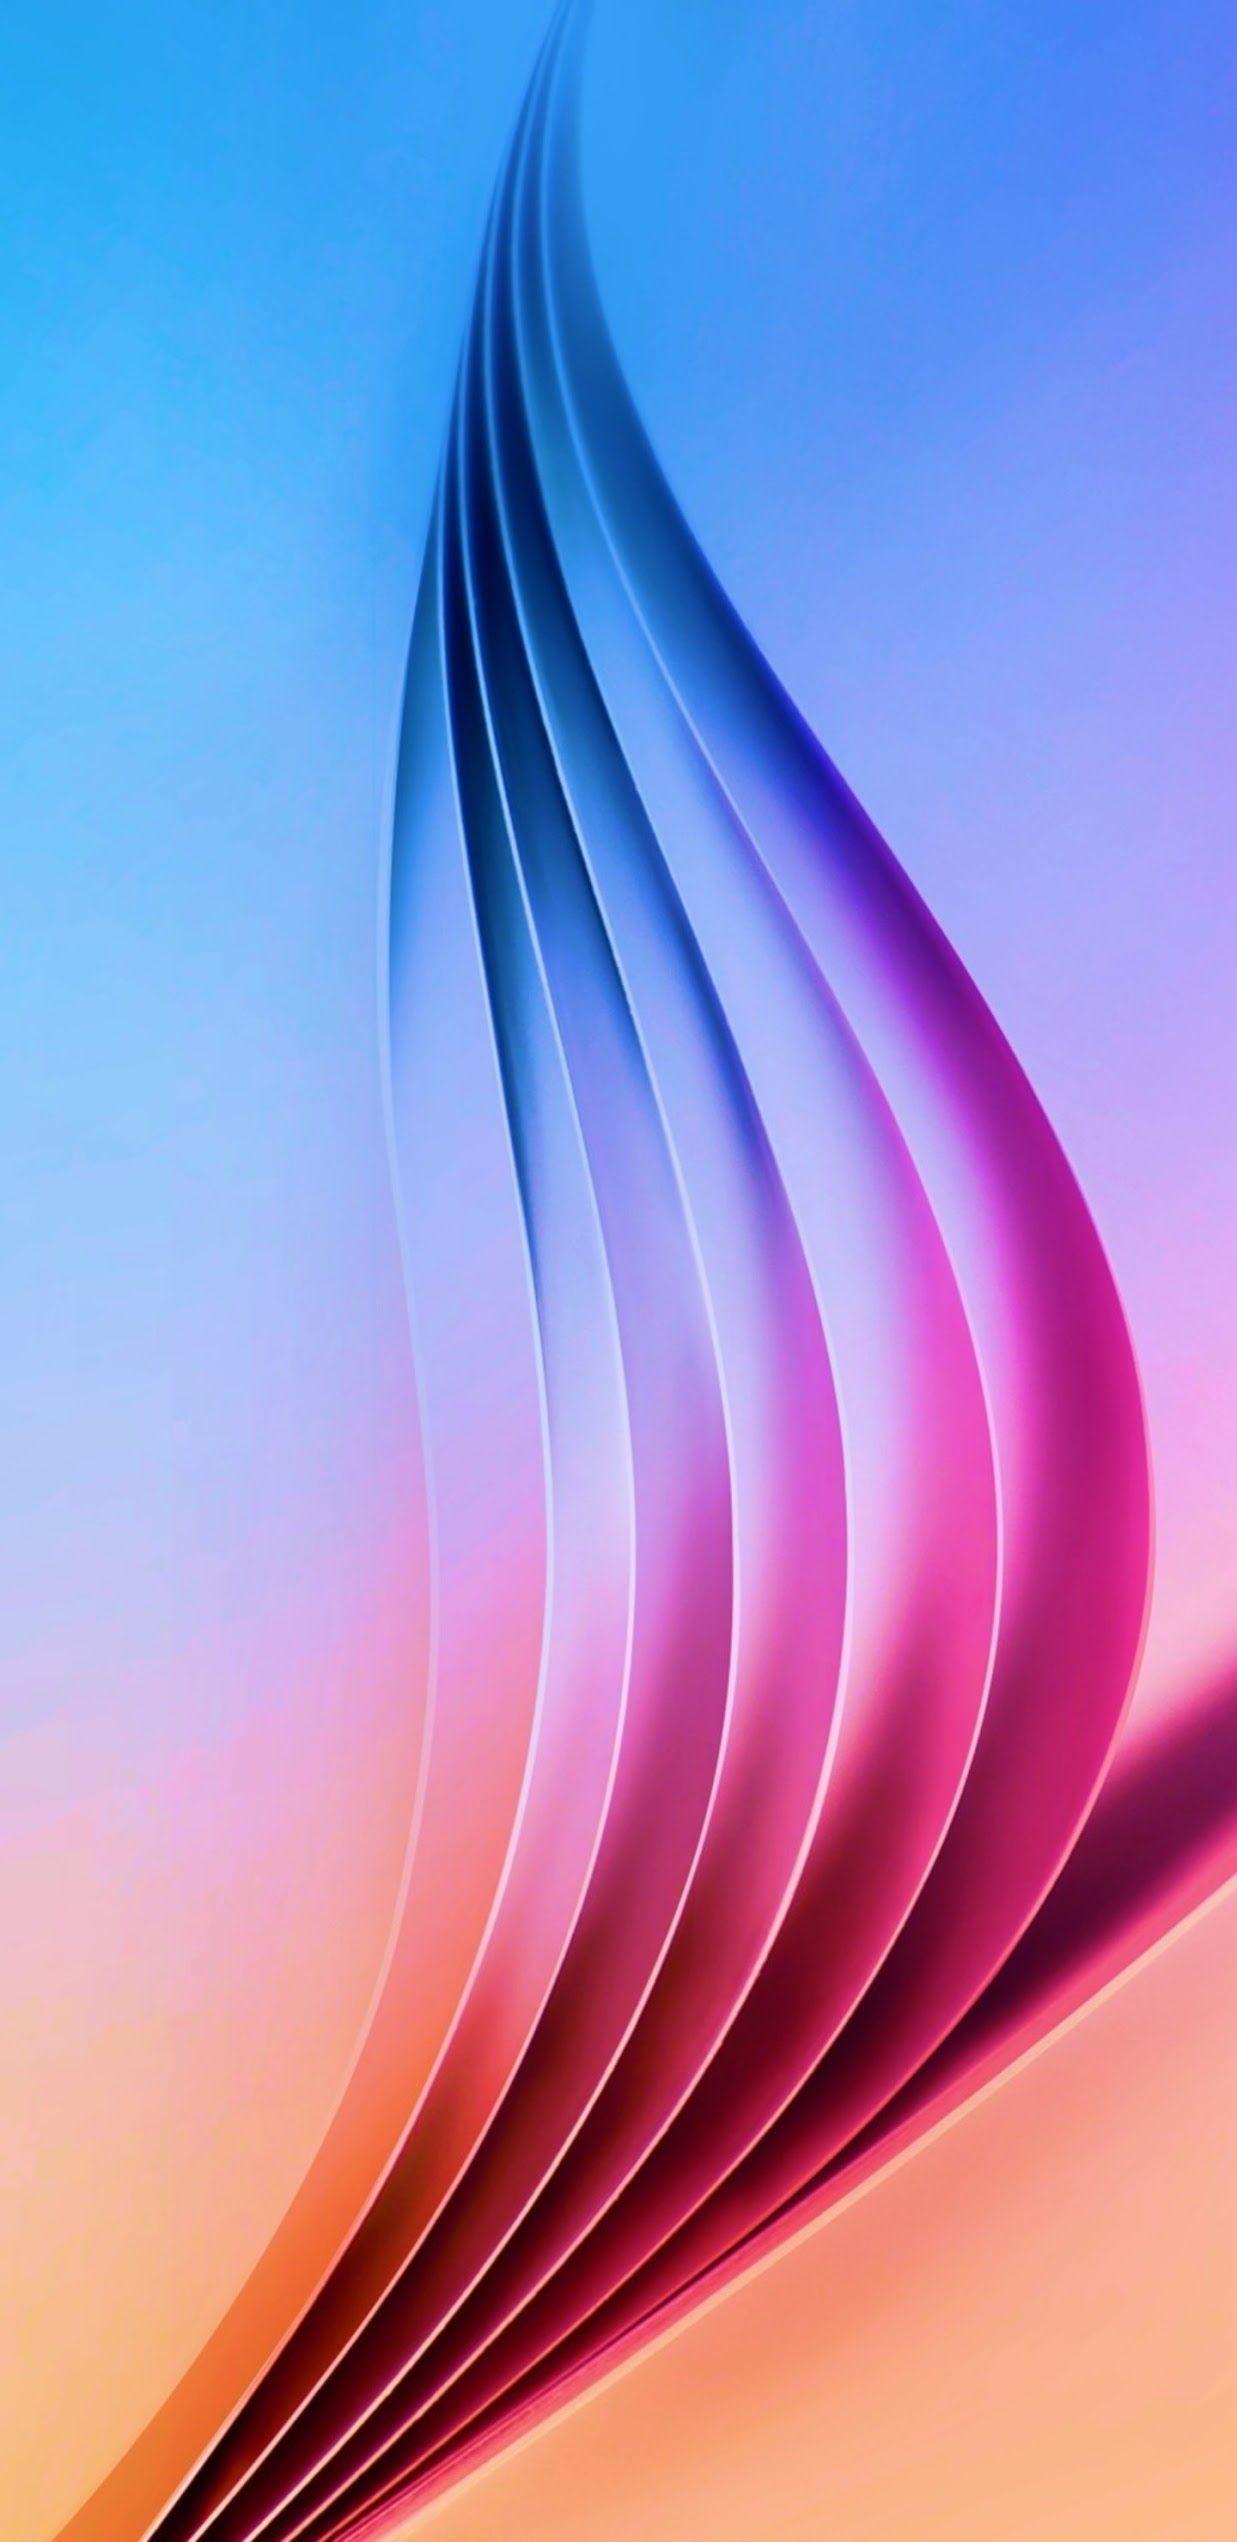 Wallpapers Samsung Galaxy S8 Pack 13 Wallsphone Fond Ecran Samsung Galaxy Fond Ecran Samsung Galaxy